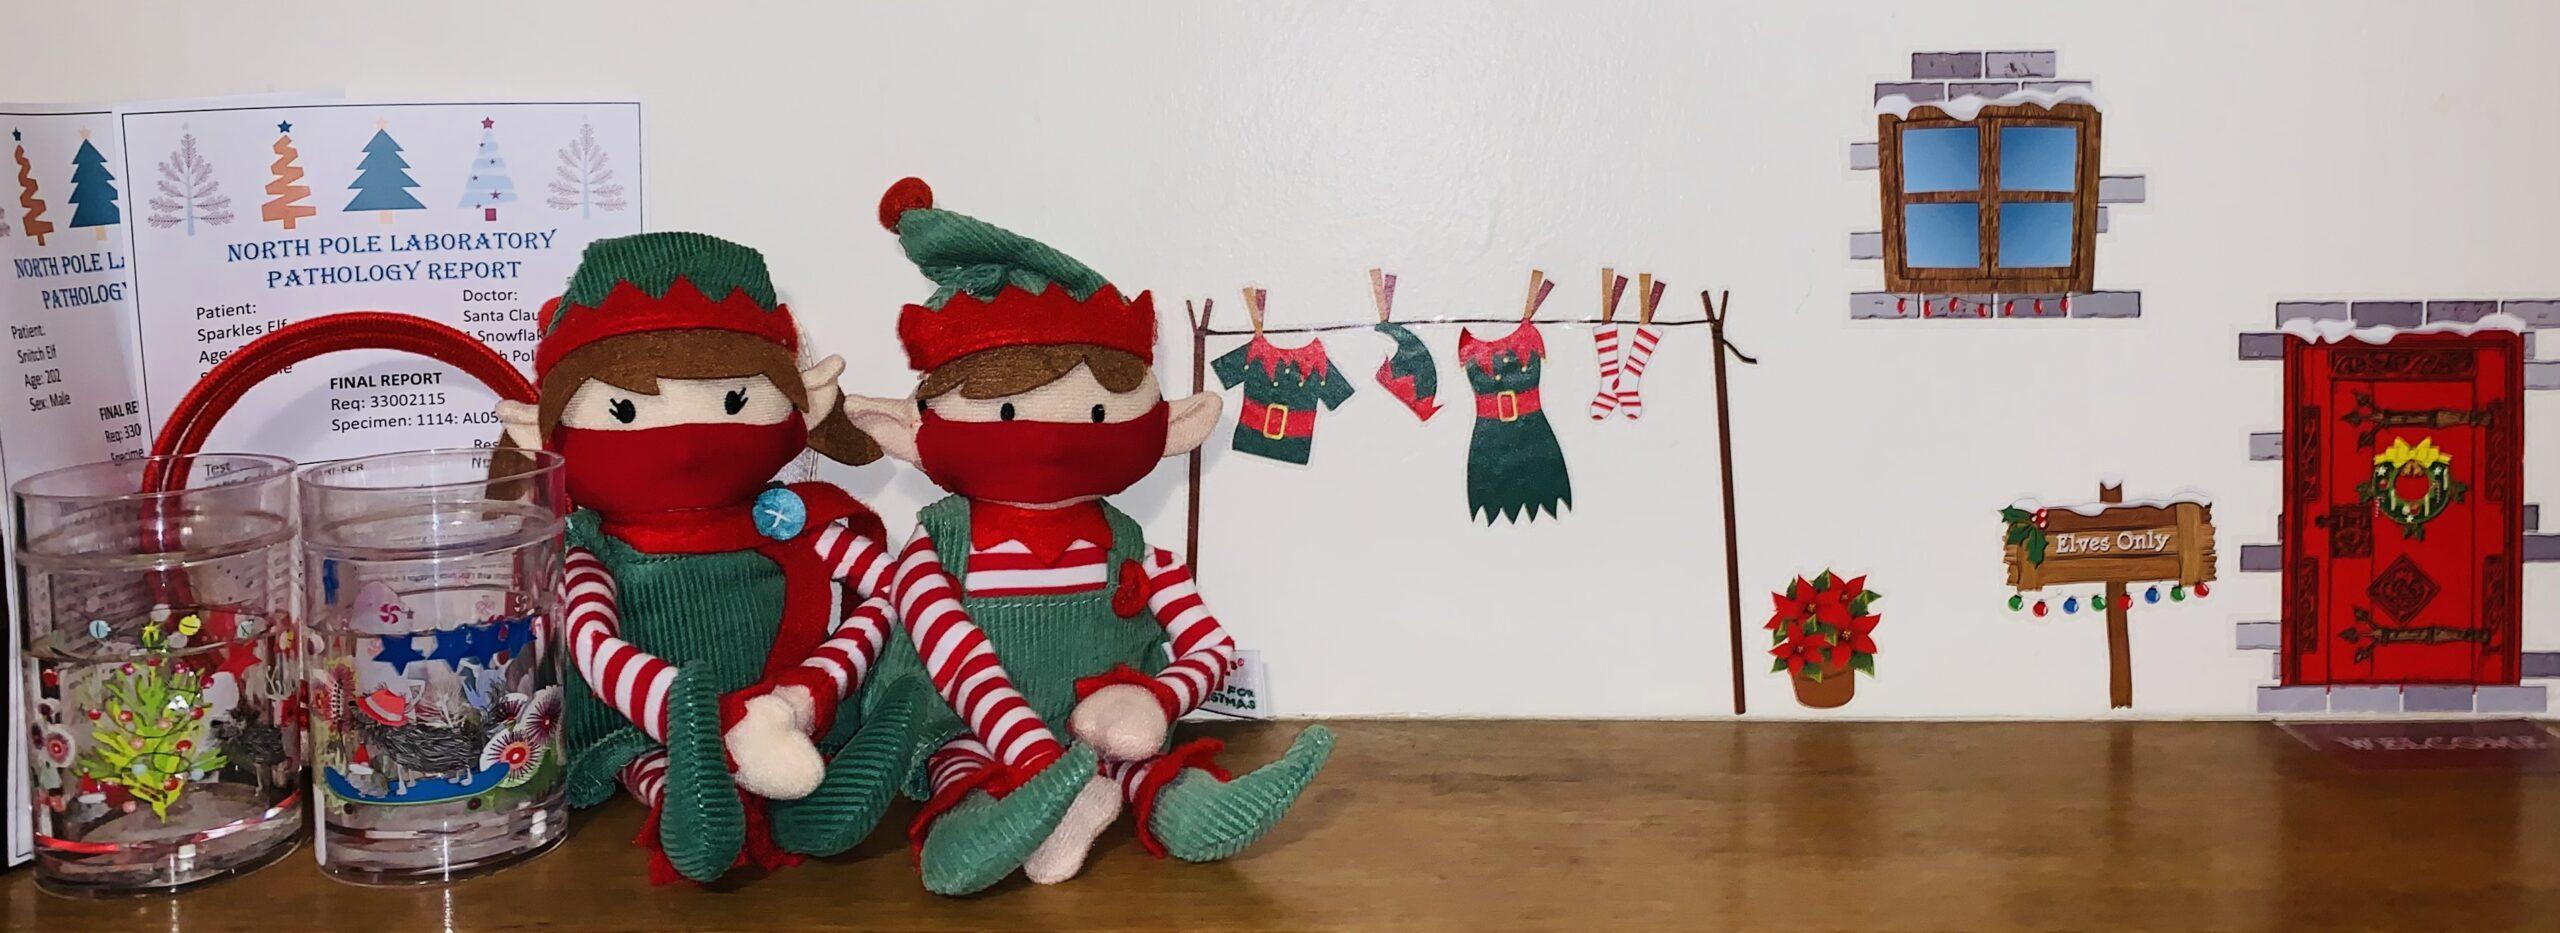 Elf on the shelf 2020